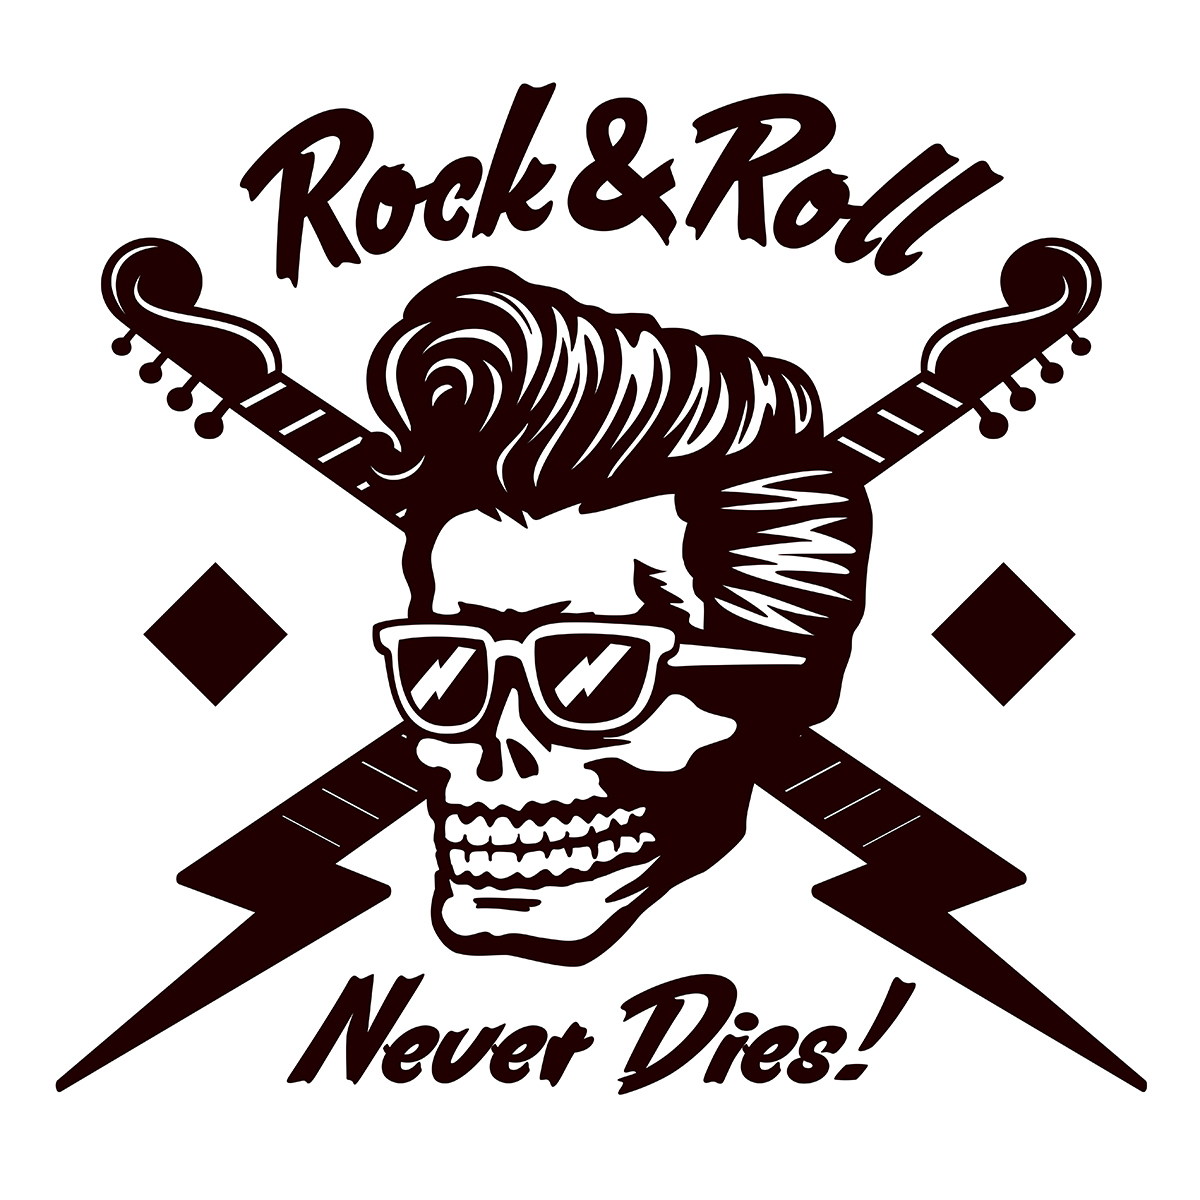 Remember - Rock & Roll Never Dies! (SIC) - Bild: durantelallera Shutterstock.com